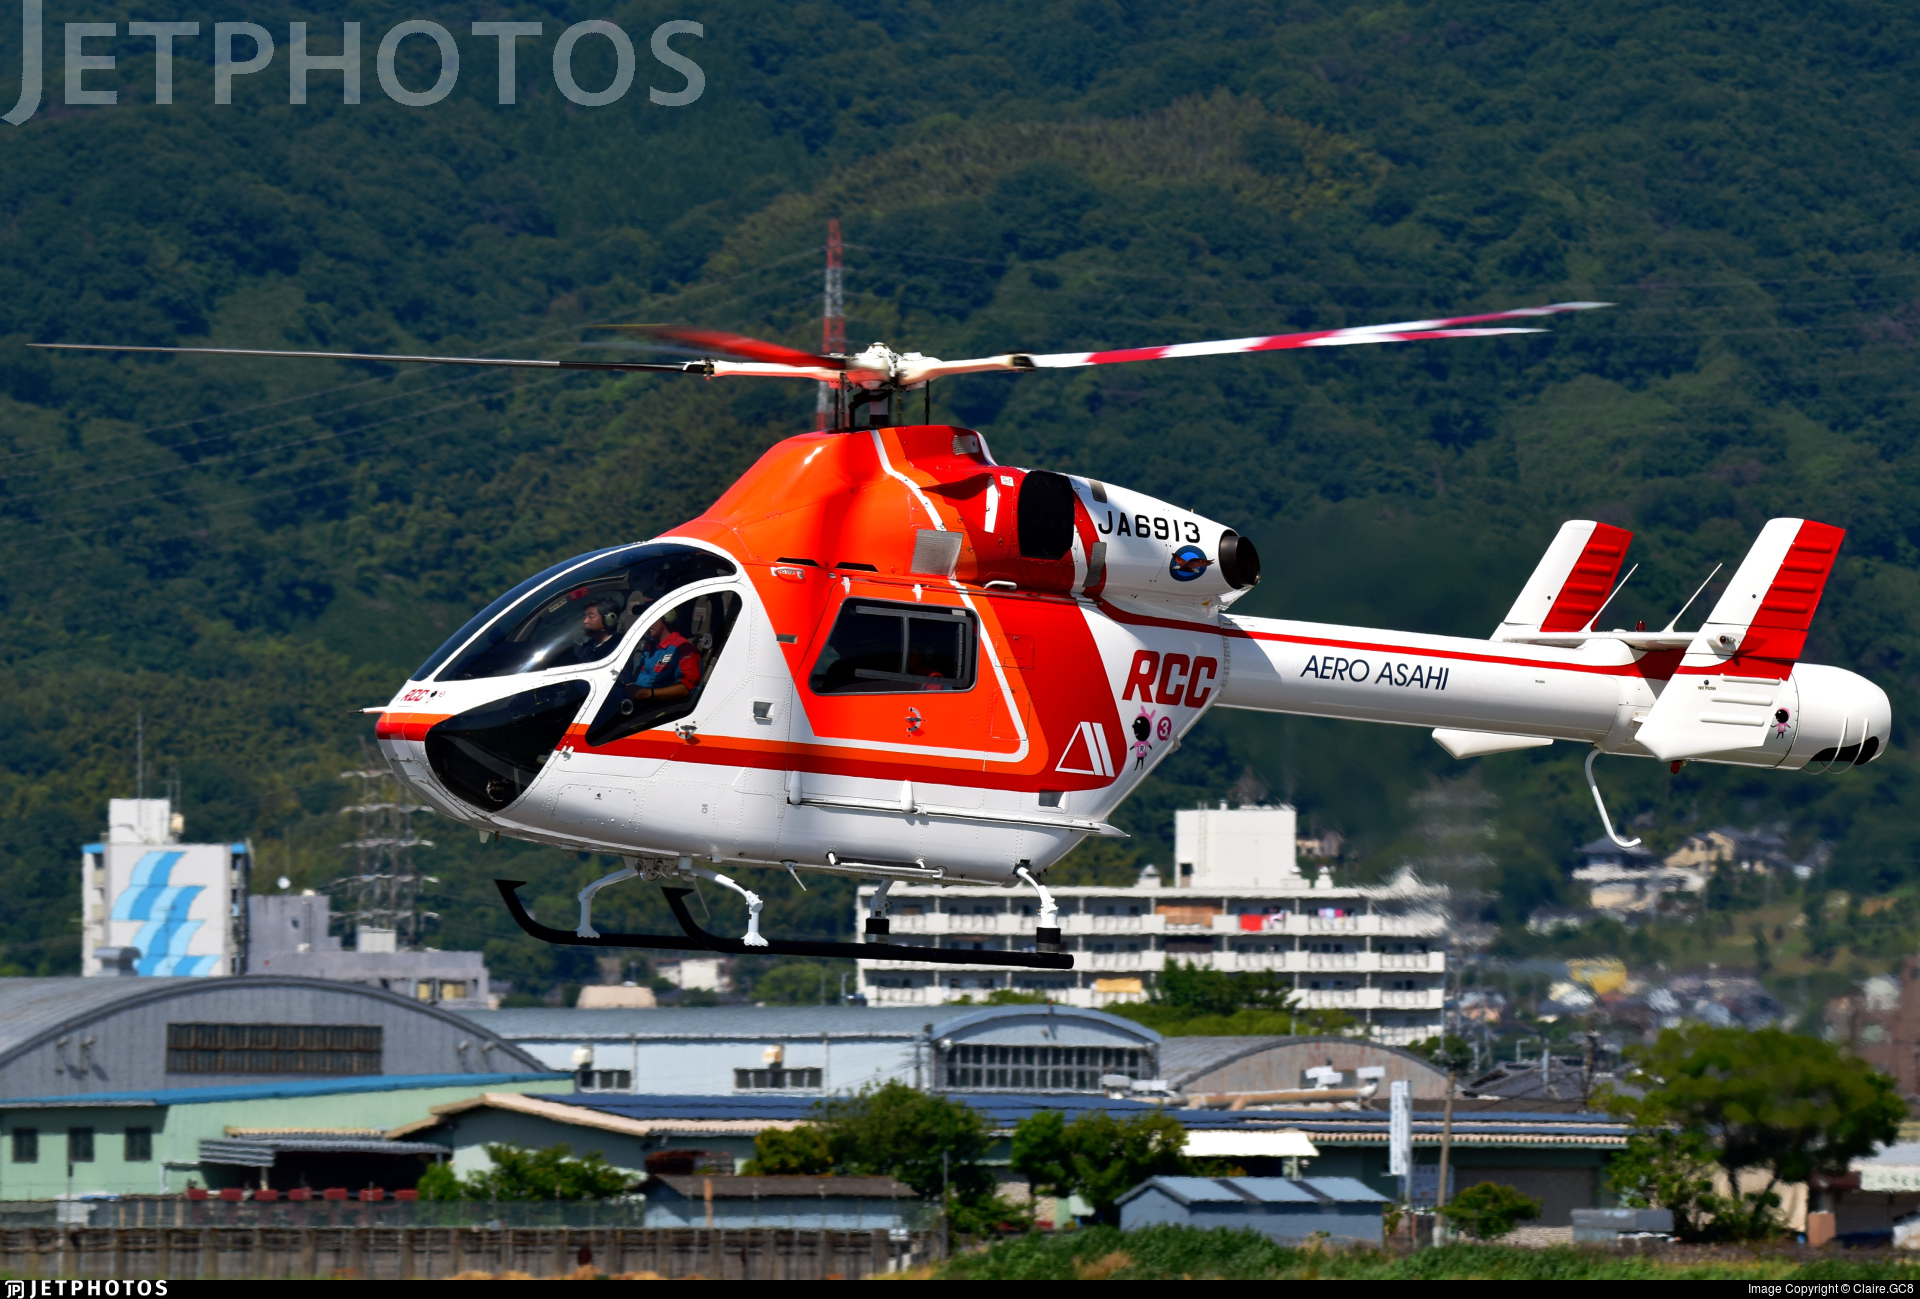 JA6913 - McDonnell Douglas MD-900 Explorer - Aero Asahi